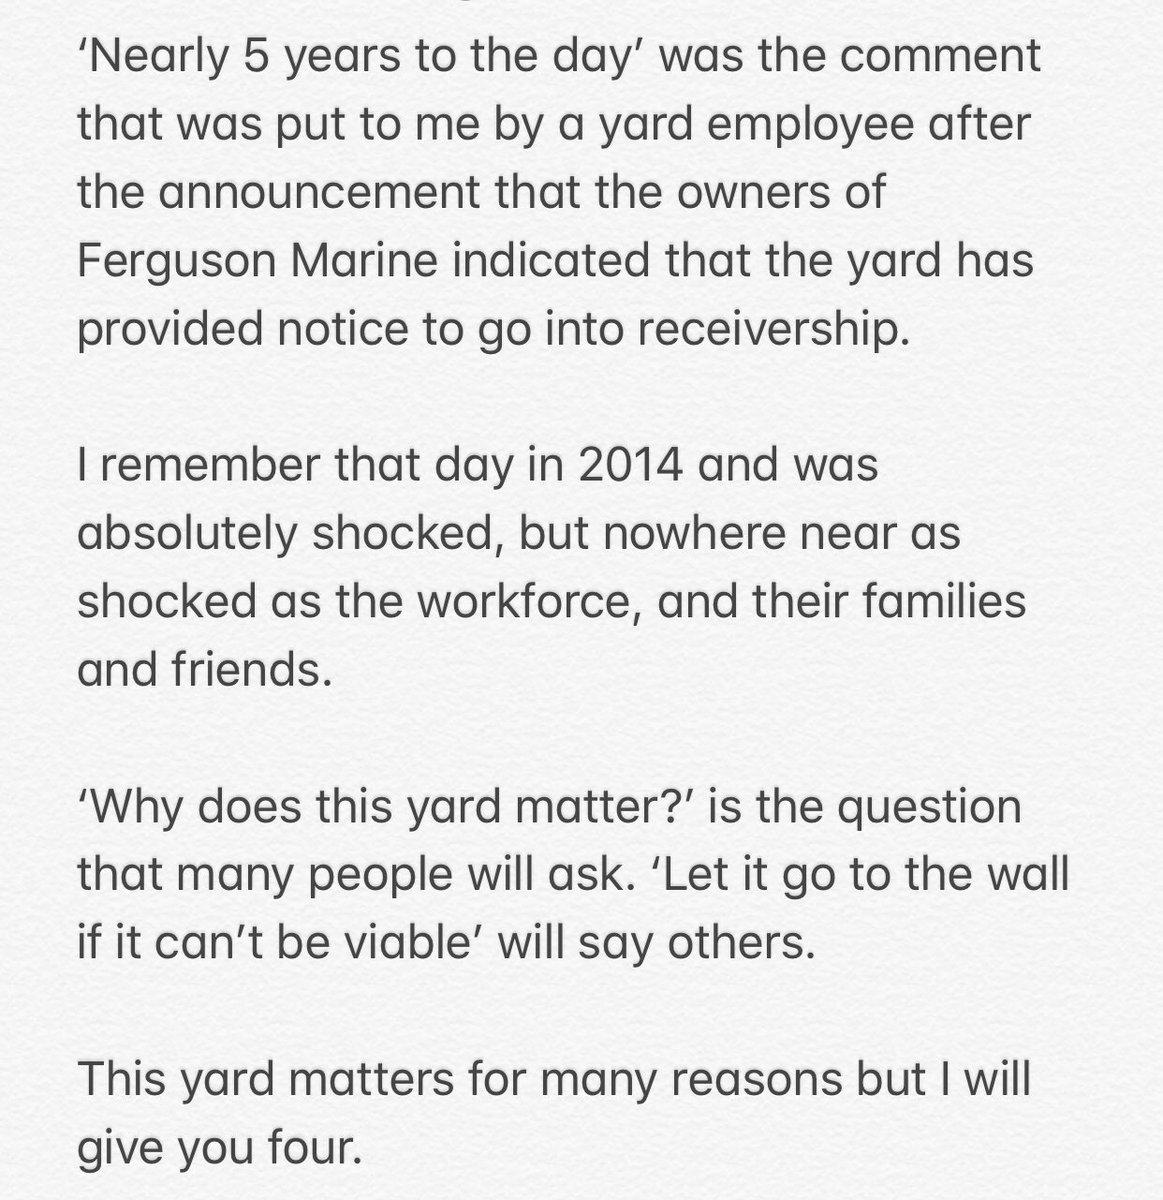 Further comment on the situation at Ferguson's Marine Engineering: #Inverclyde #fergusonsmarine #portglasgow #MSP #shipbuilding #scottishpolitics @theSNP @Inverclyde_SNP @greenocktele